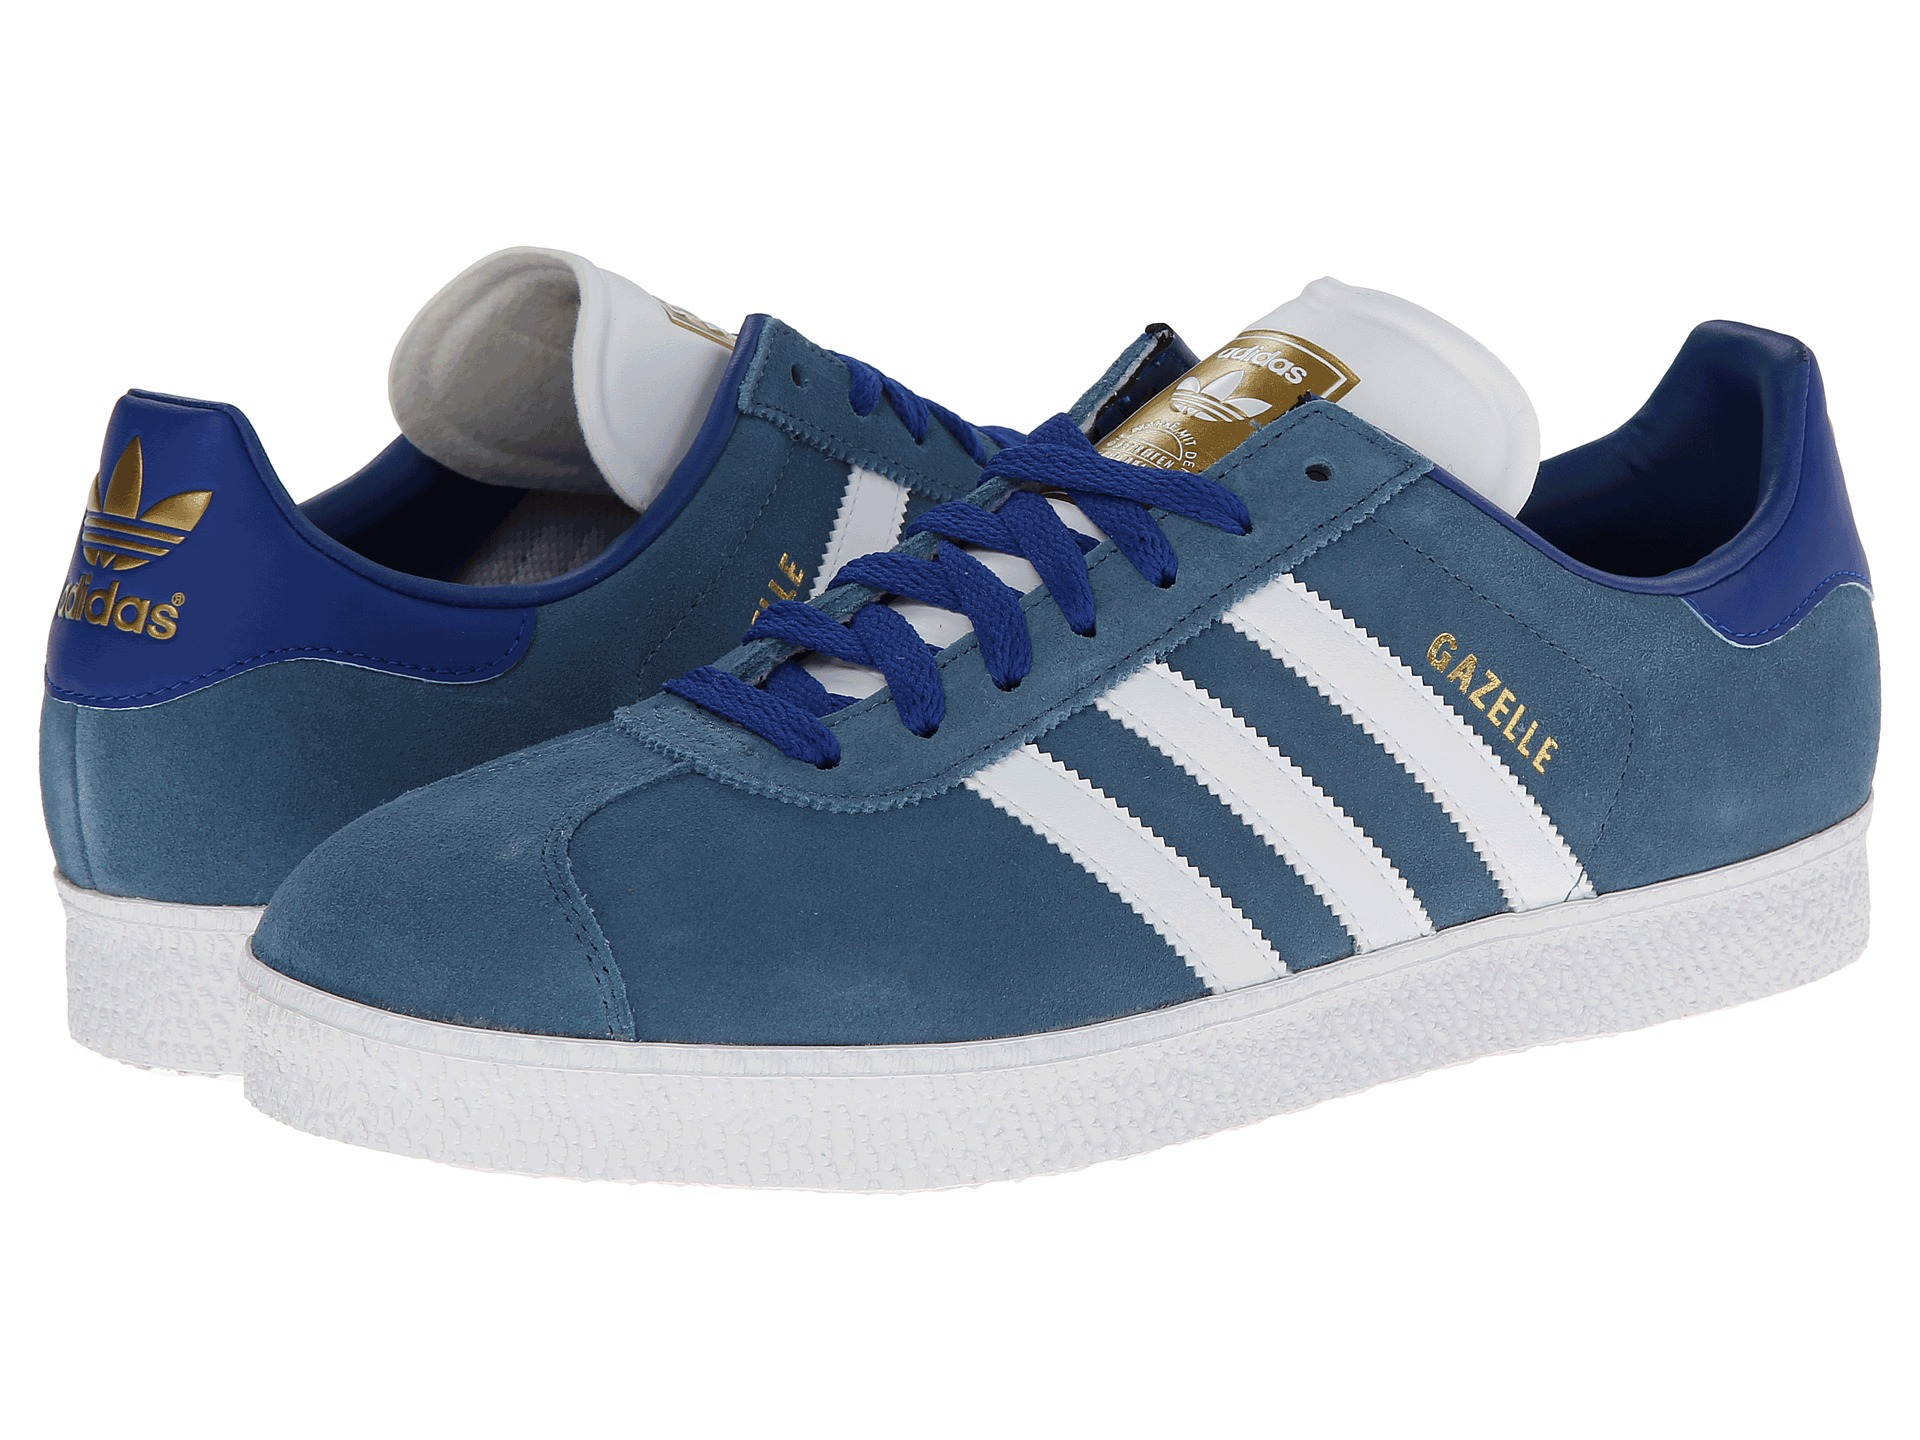 b84de6043 Coupon Adidas Ultra Boost 4.0 Us 6.5 Foot Locker St Catherine